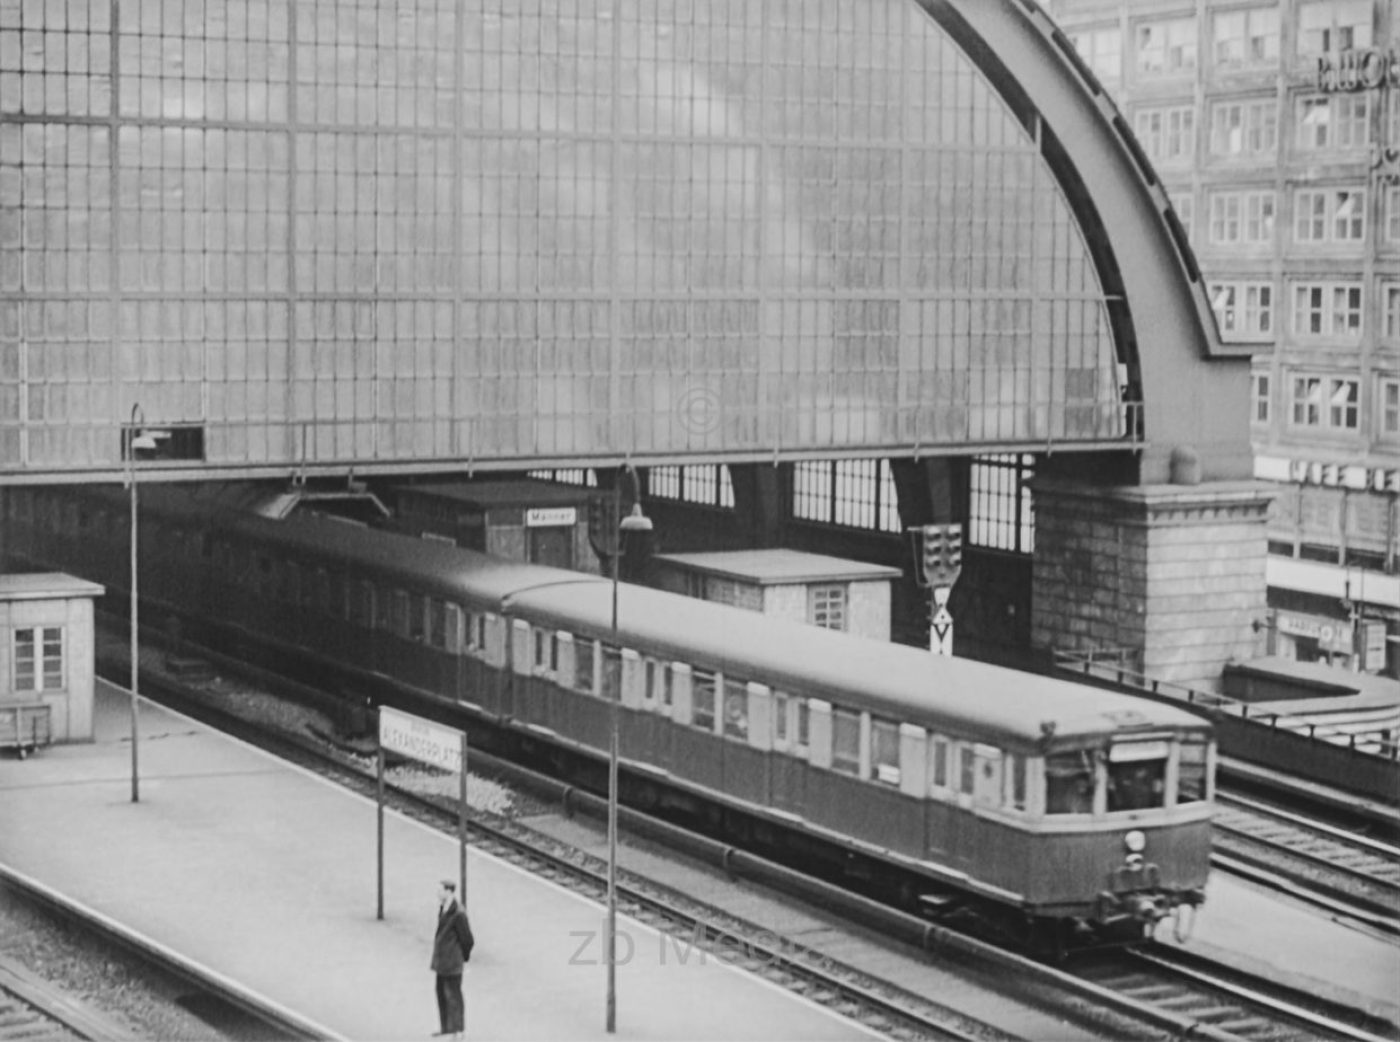 Deutschland 1937, Bahnhof Berlin Alexanderplatz